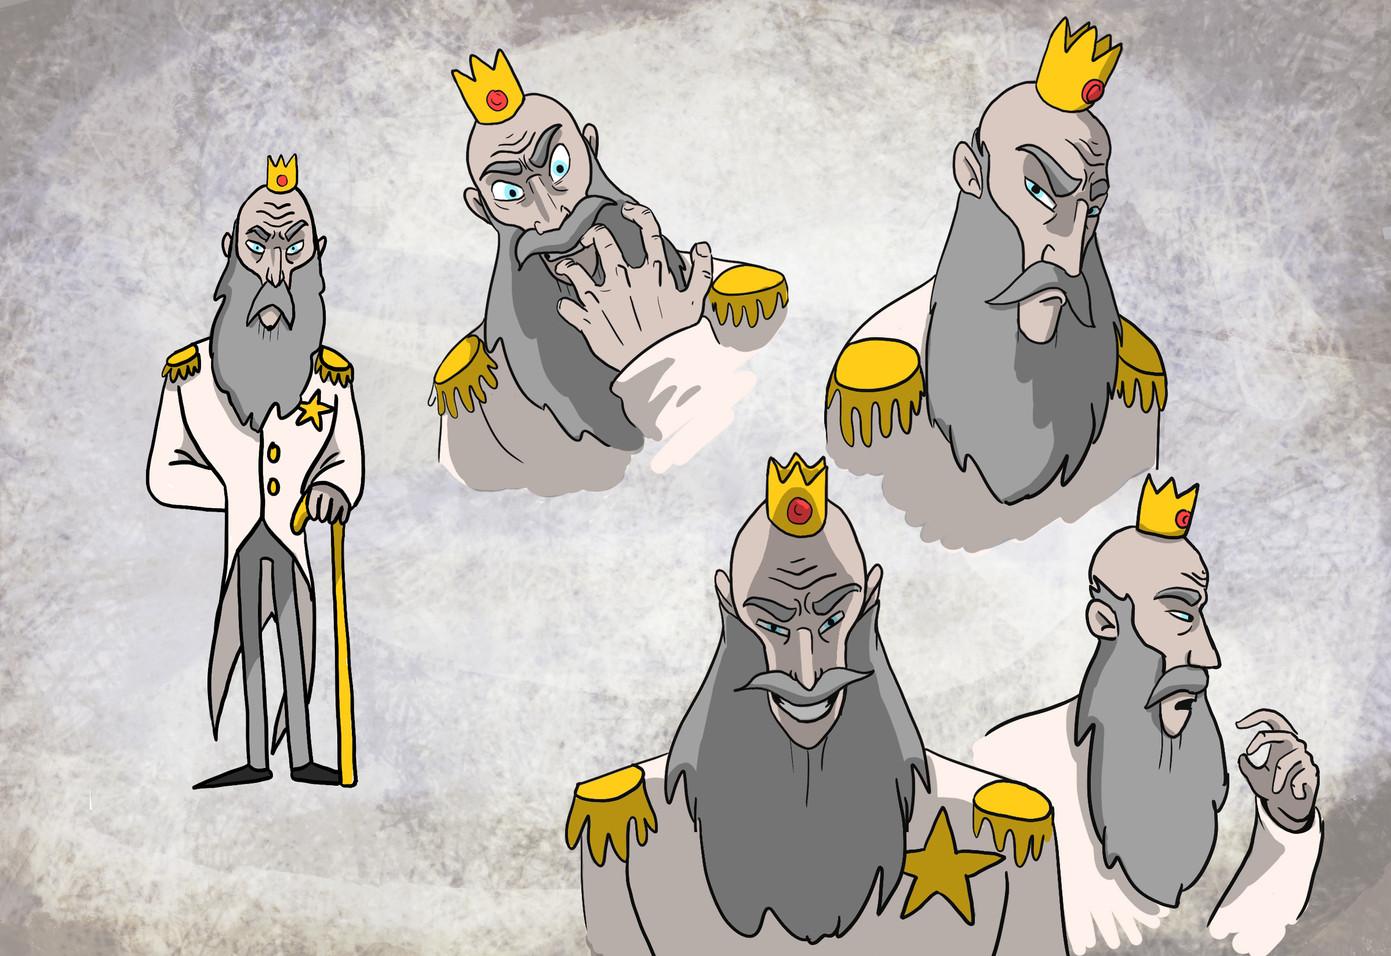 Mr. Leopold